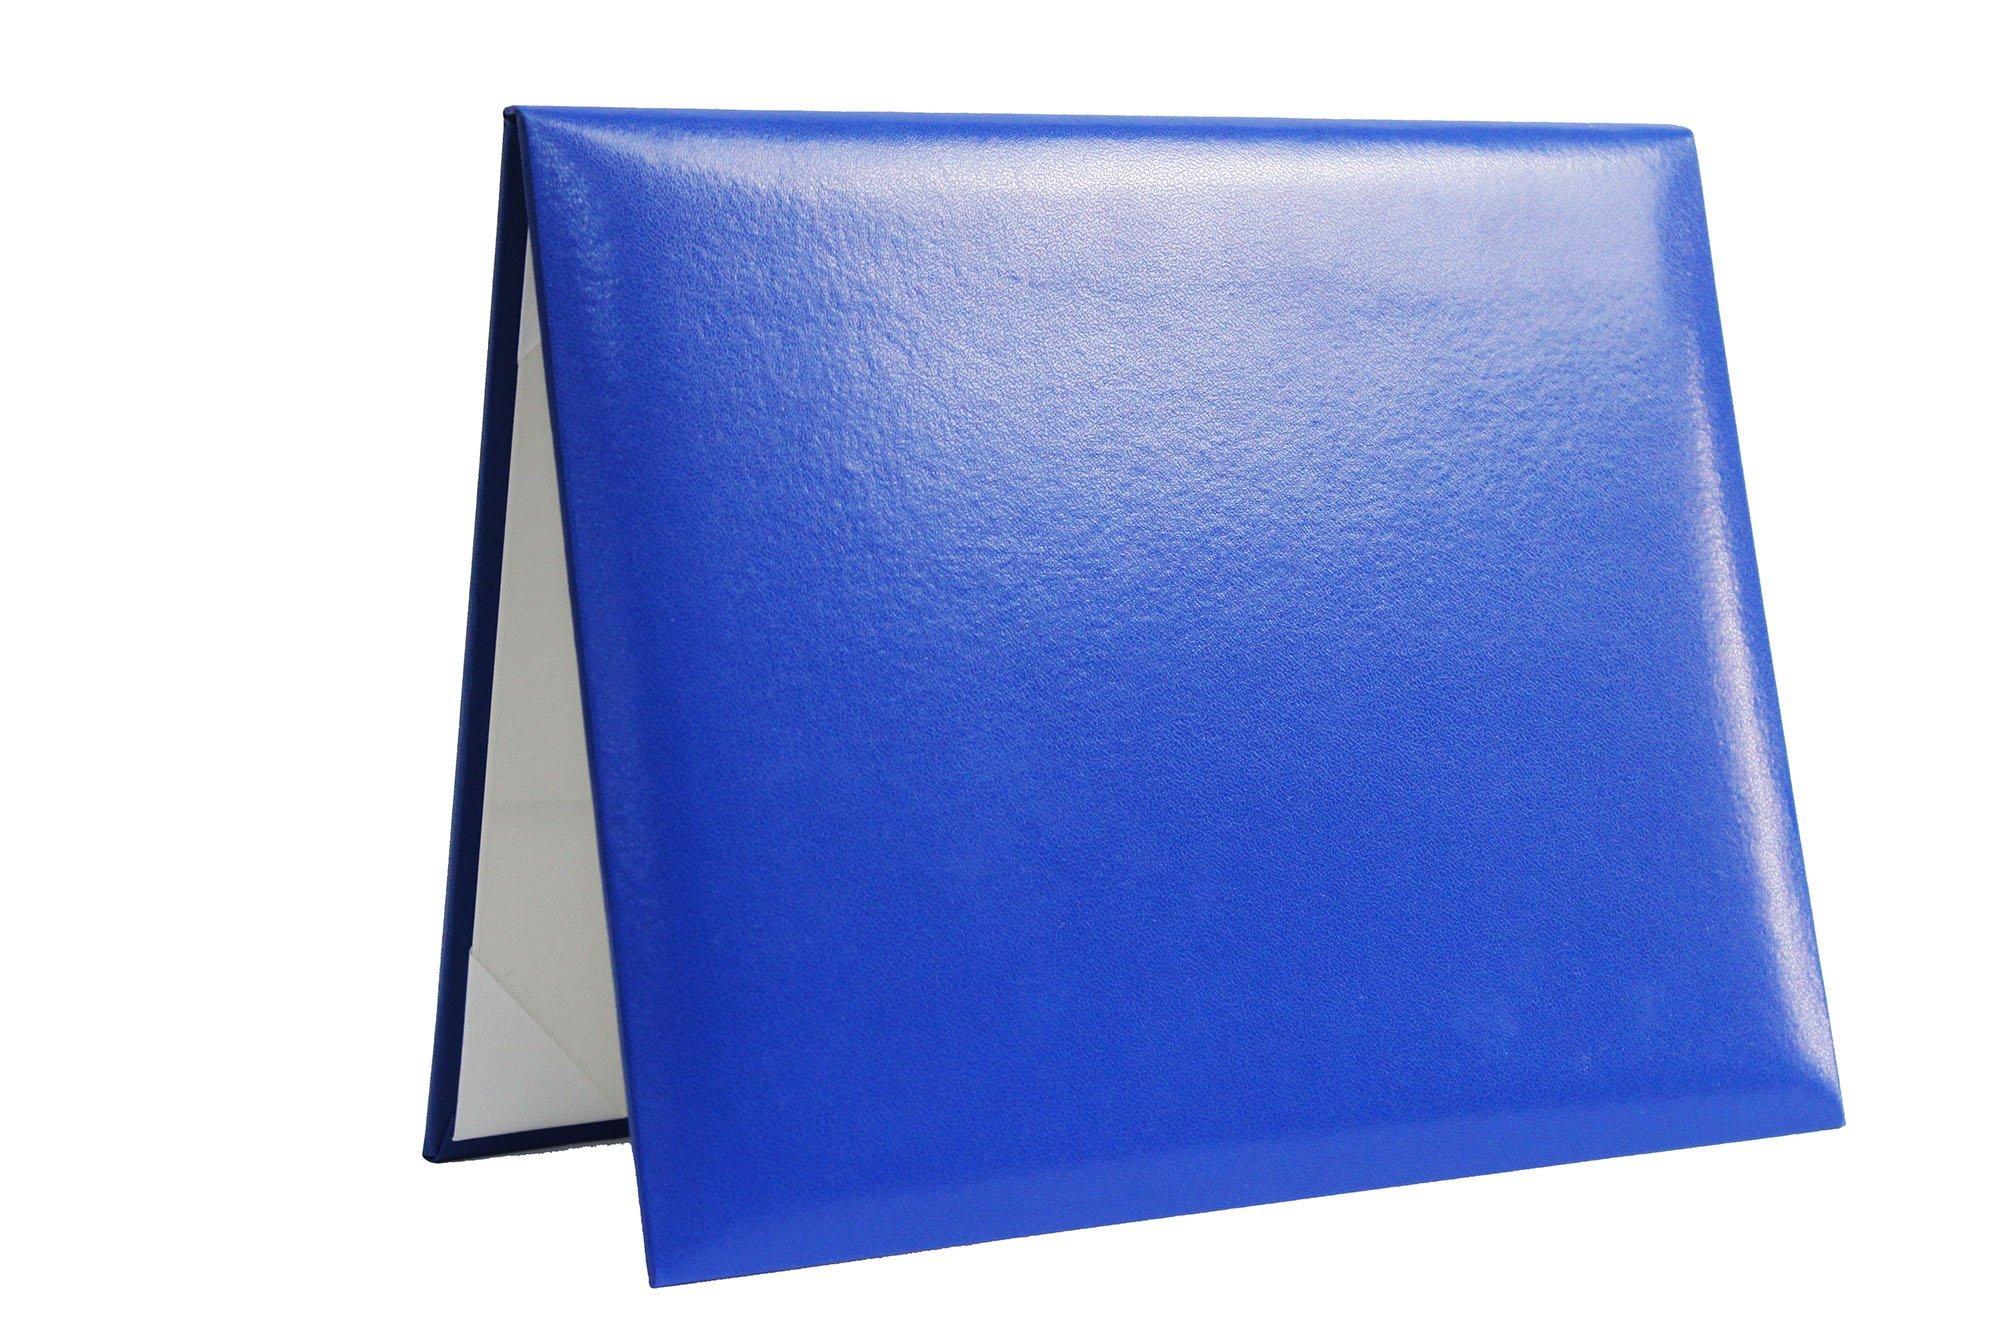 GradPlaza Royal Blue Smooth Diploma Cover 8 1/2''x11